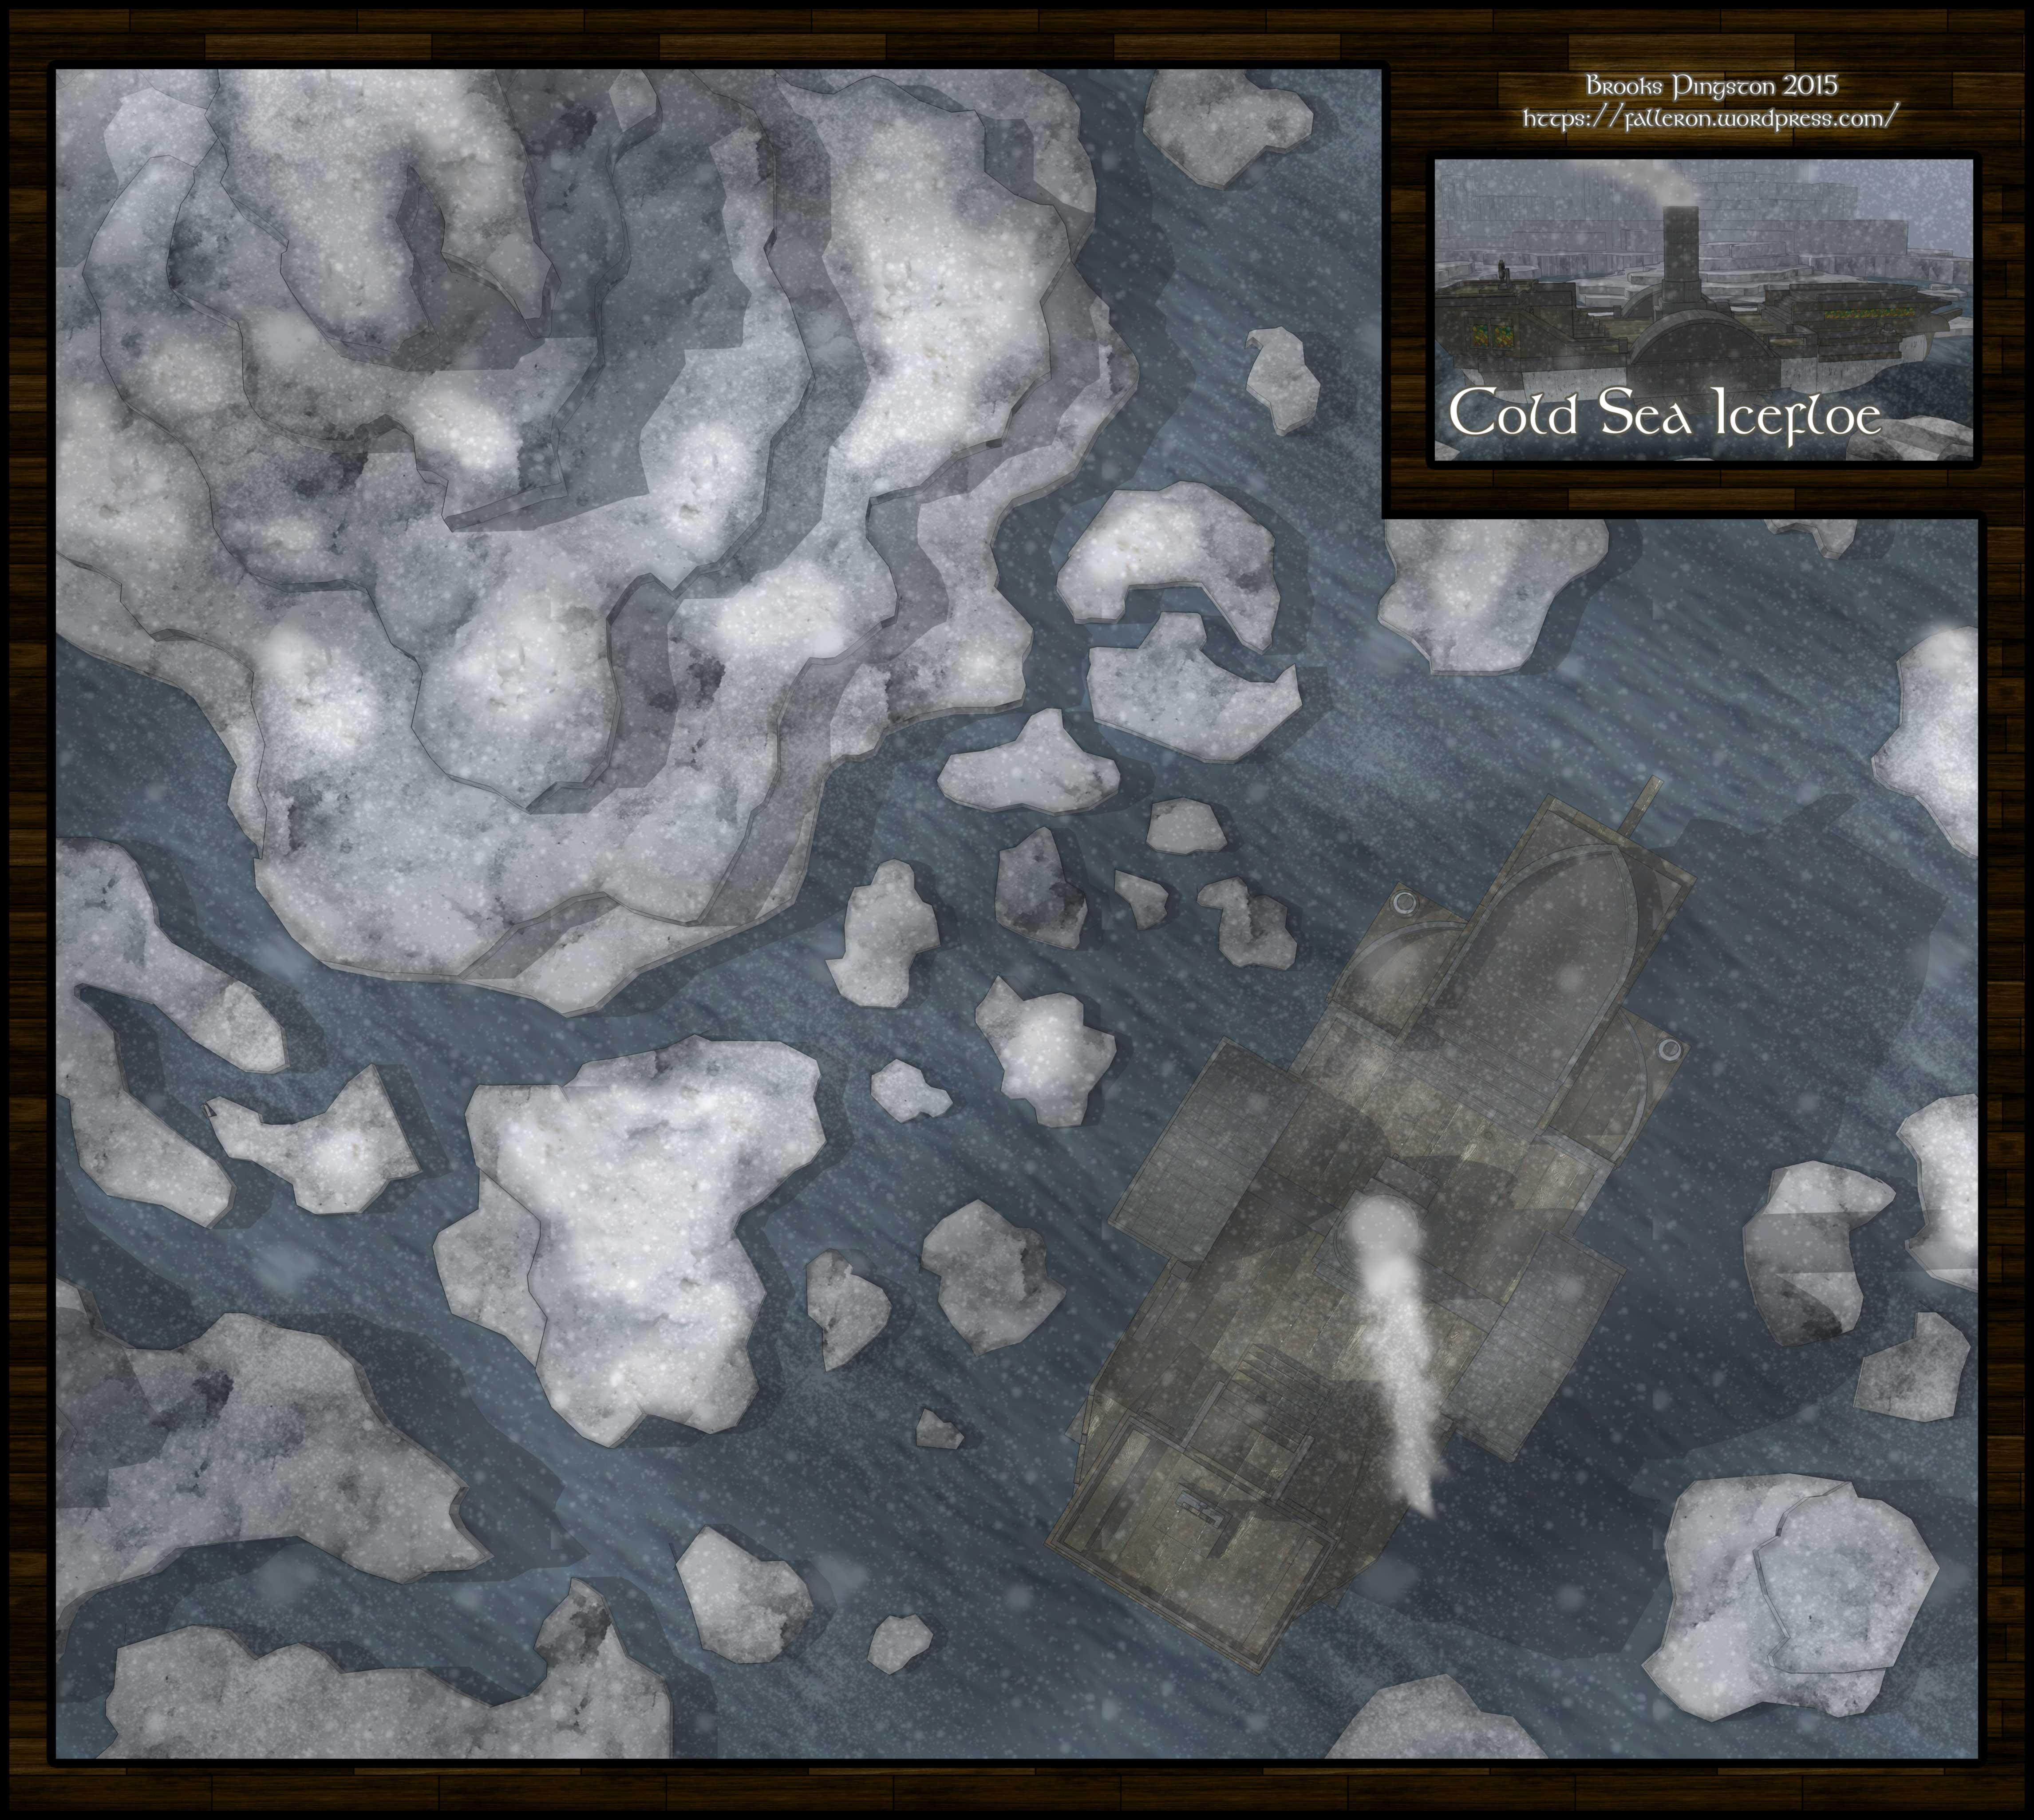 lazy-minnow-cold-sea-ice-floe.jpg